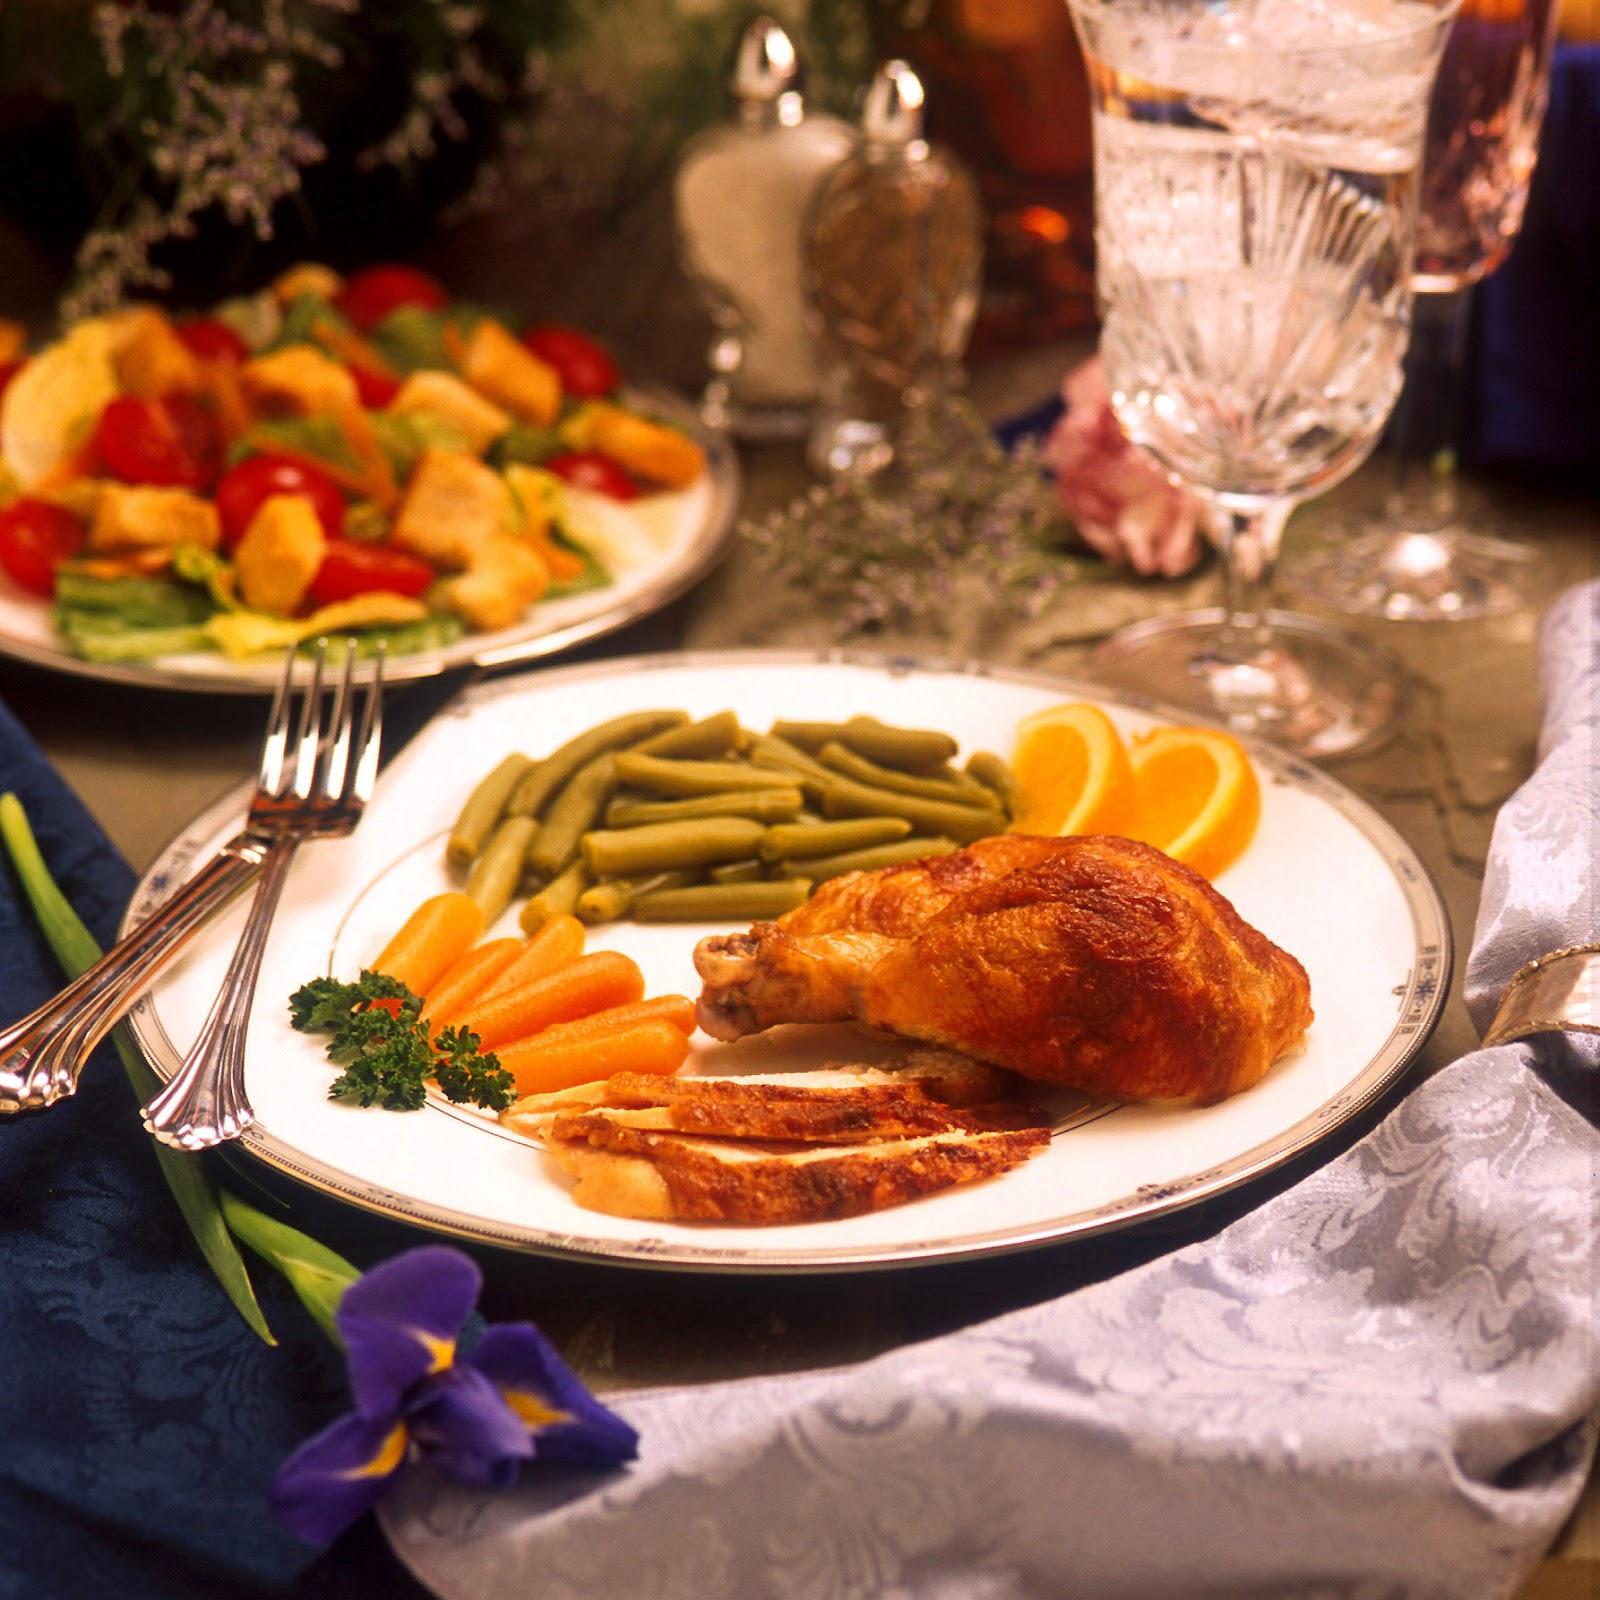 A formal American dinner